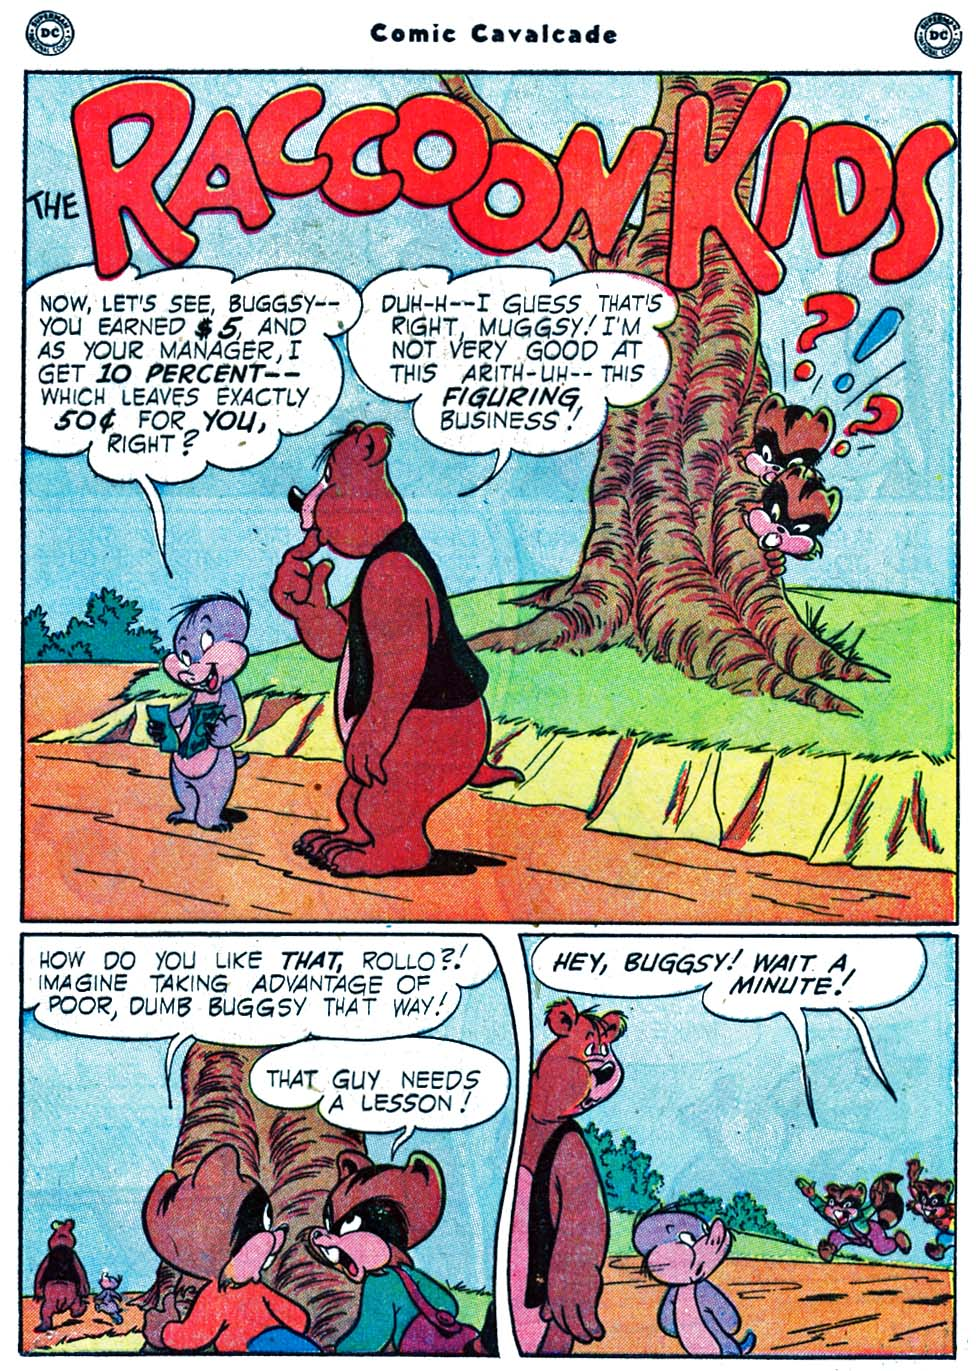 Comic Cavalcade issue 39 - Page 13